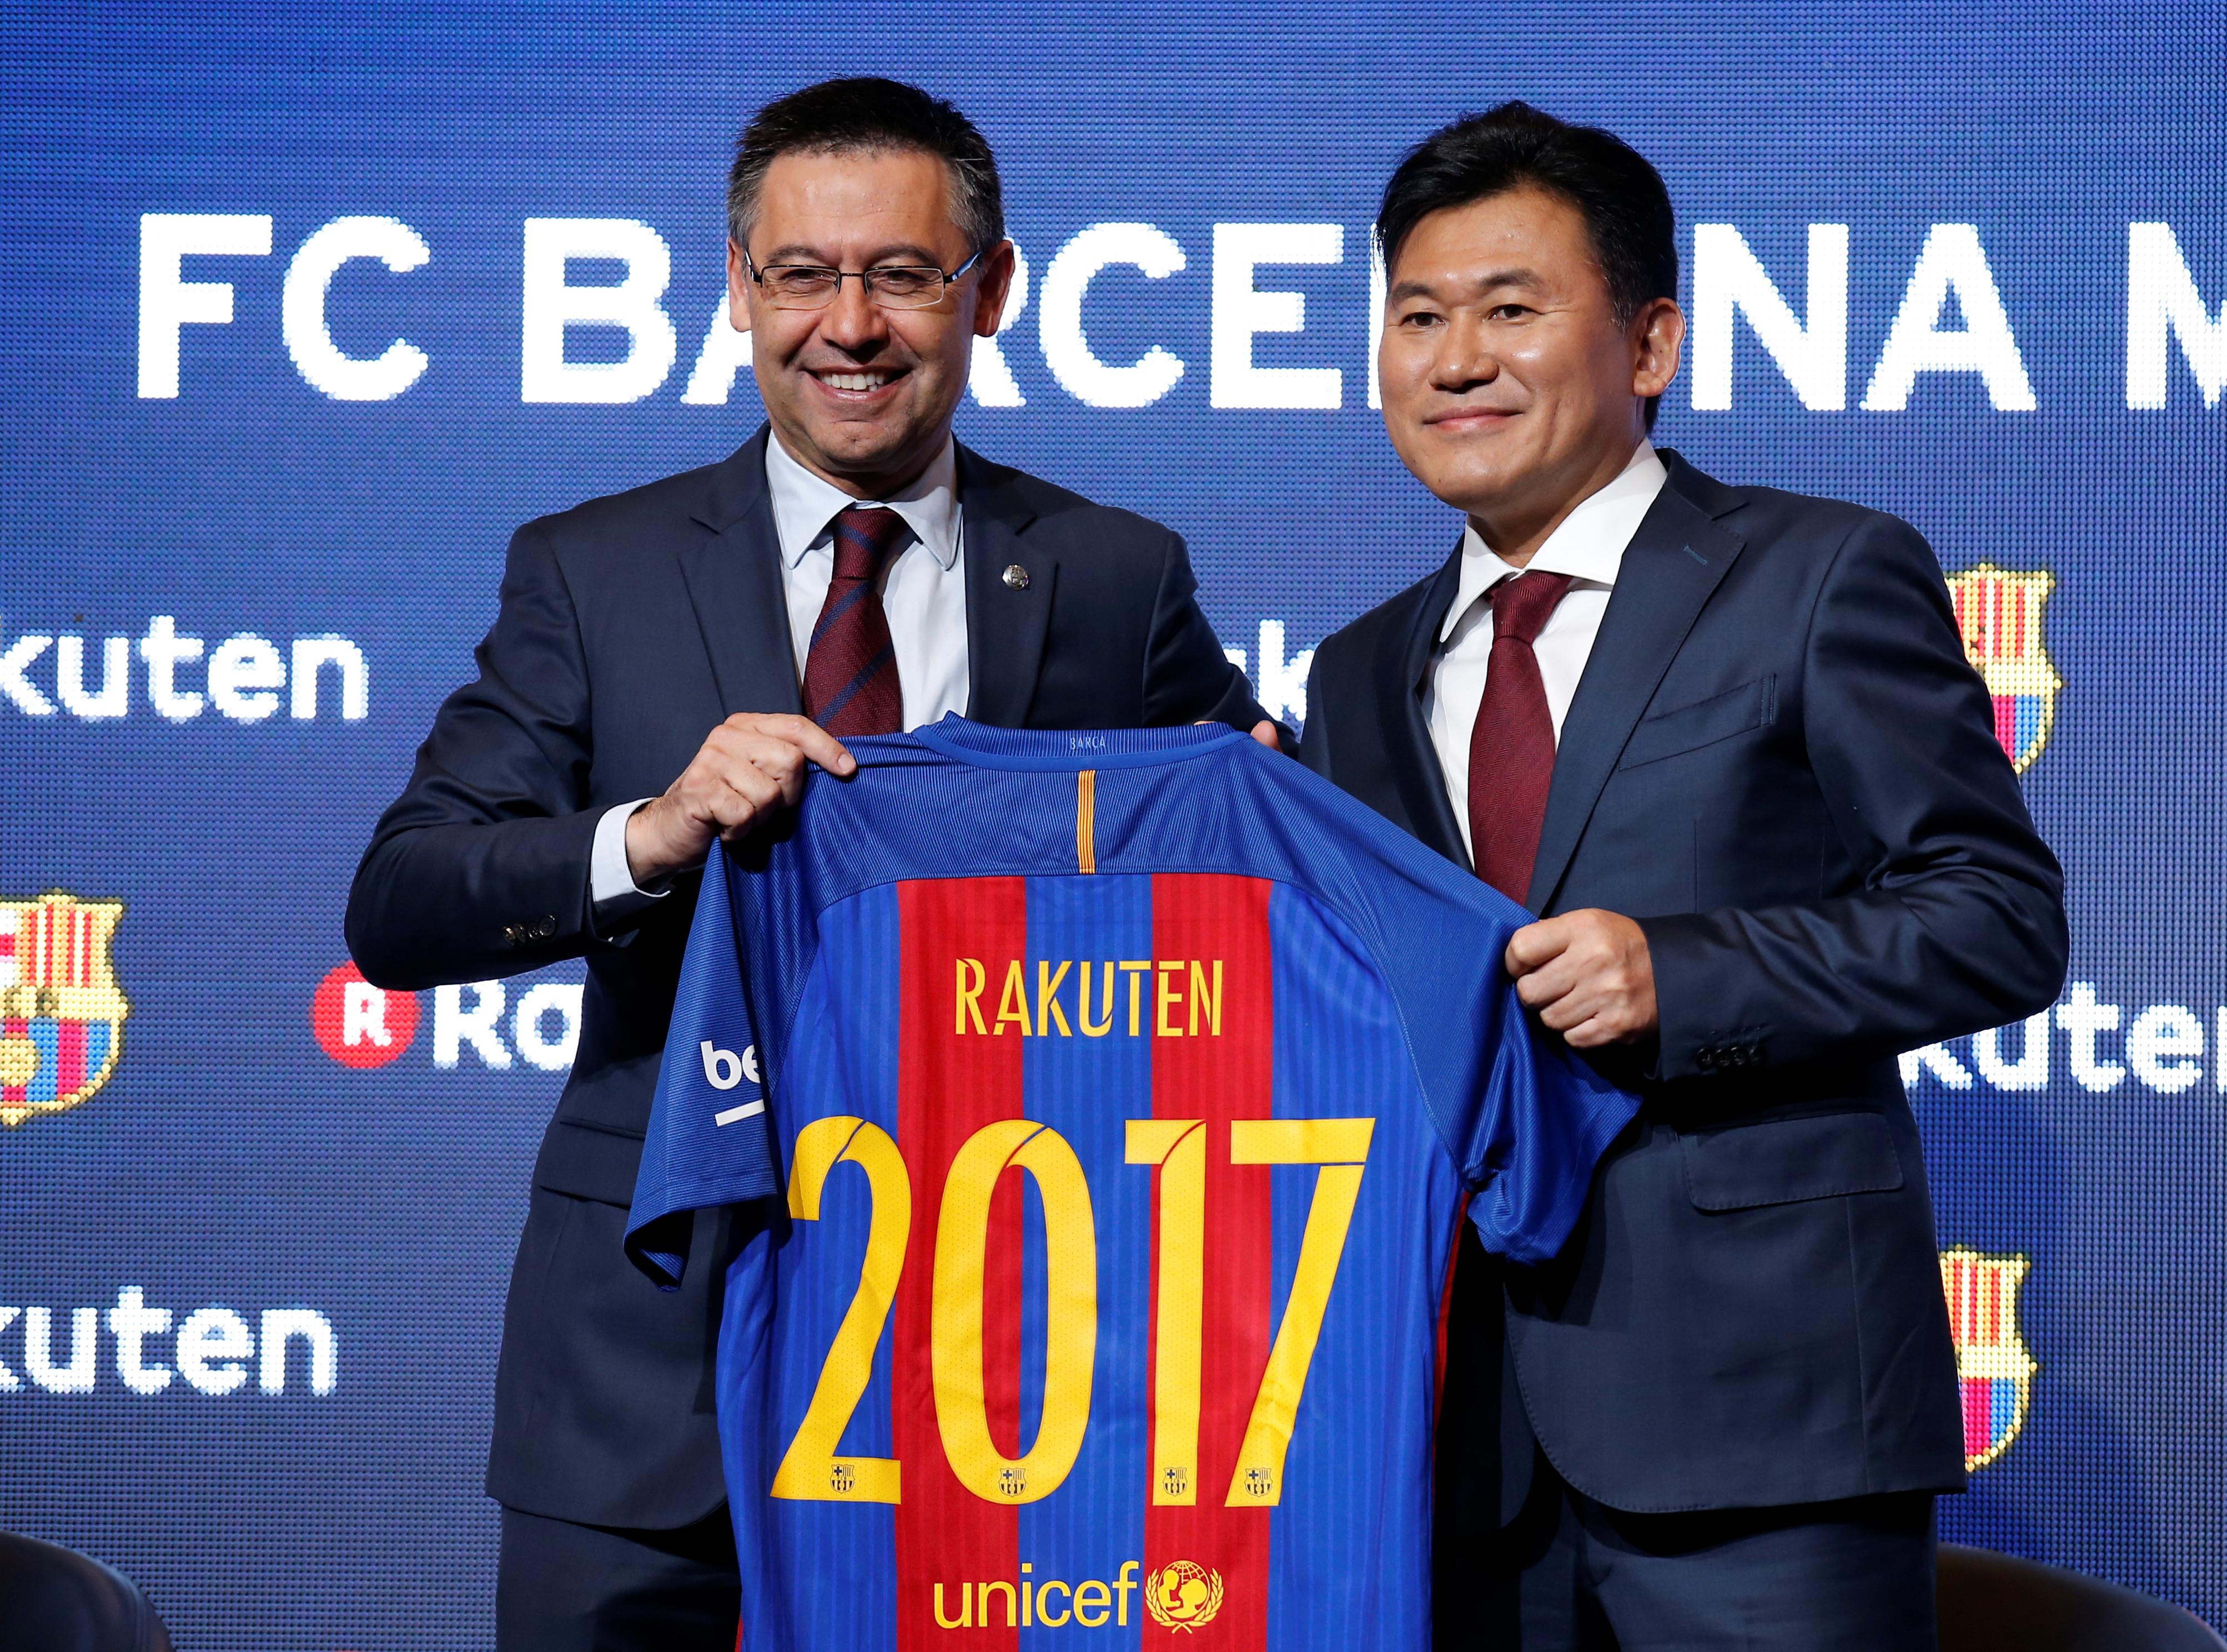 FC Barcelona's President Josep Maria Bartomeu and Rakuten's President and CEO Hiroshi Mikitani